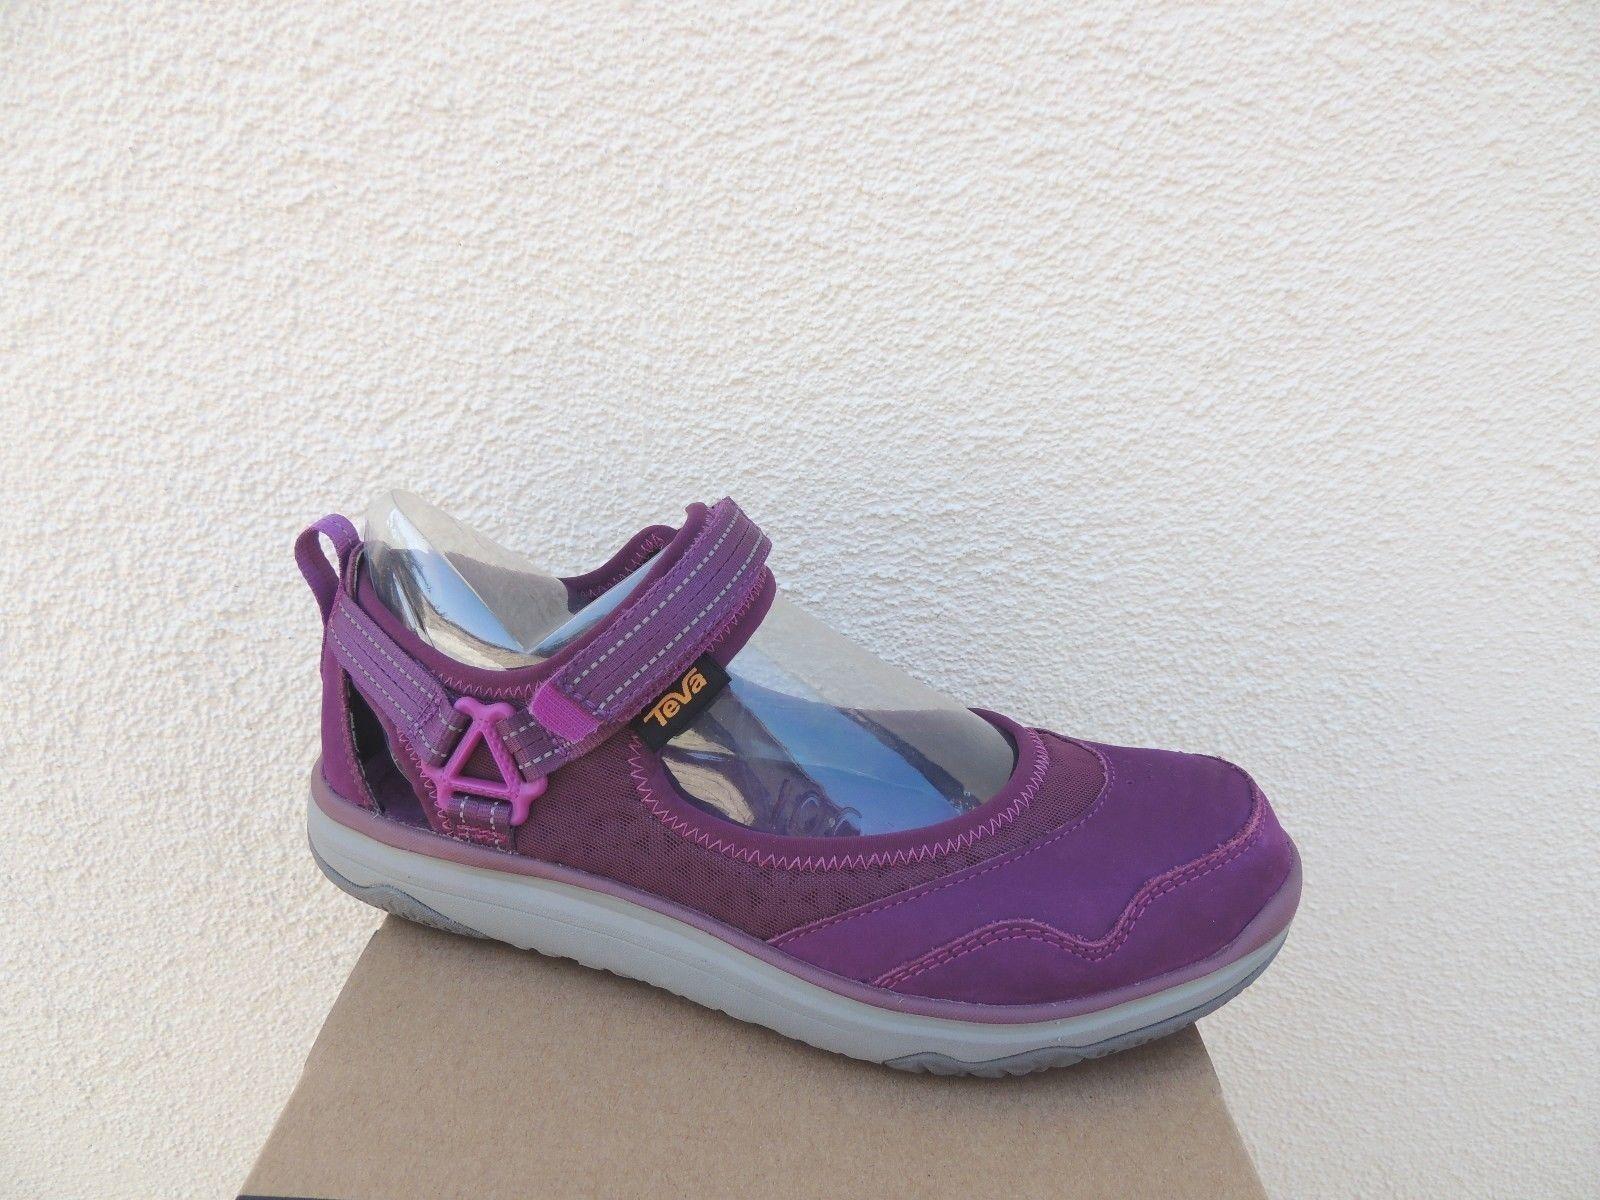 TEVA FLOAT DARK PURPLE LEATHER TERRA FLOAT TEVA TRAVEL MJ MARY-JANE Schuhe, US 8/ EUR 39 NEW 498150